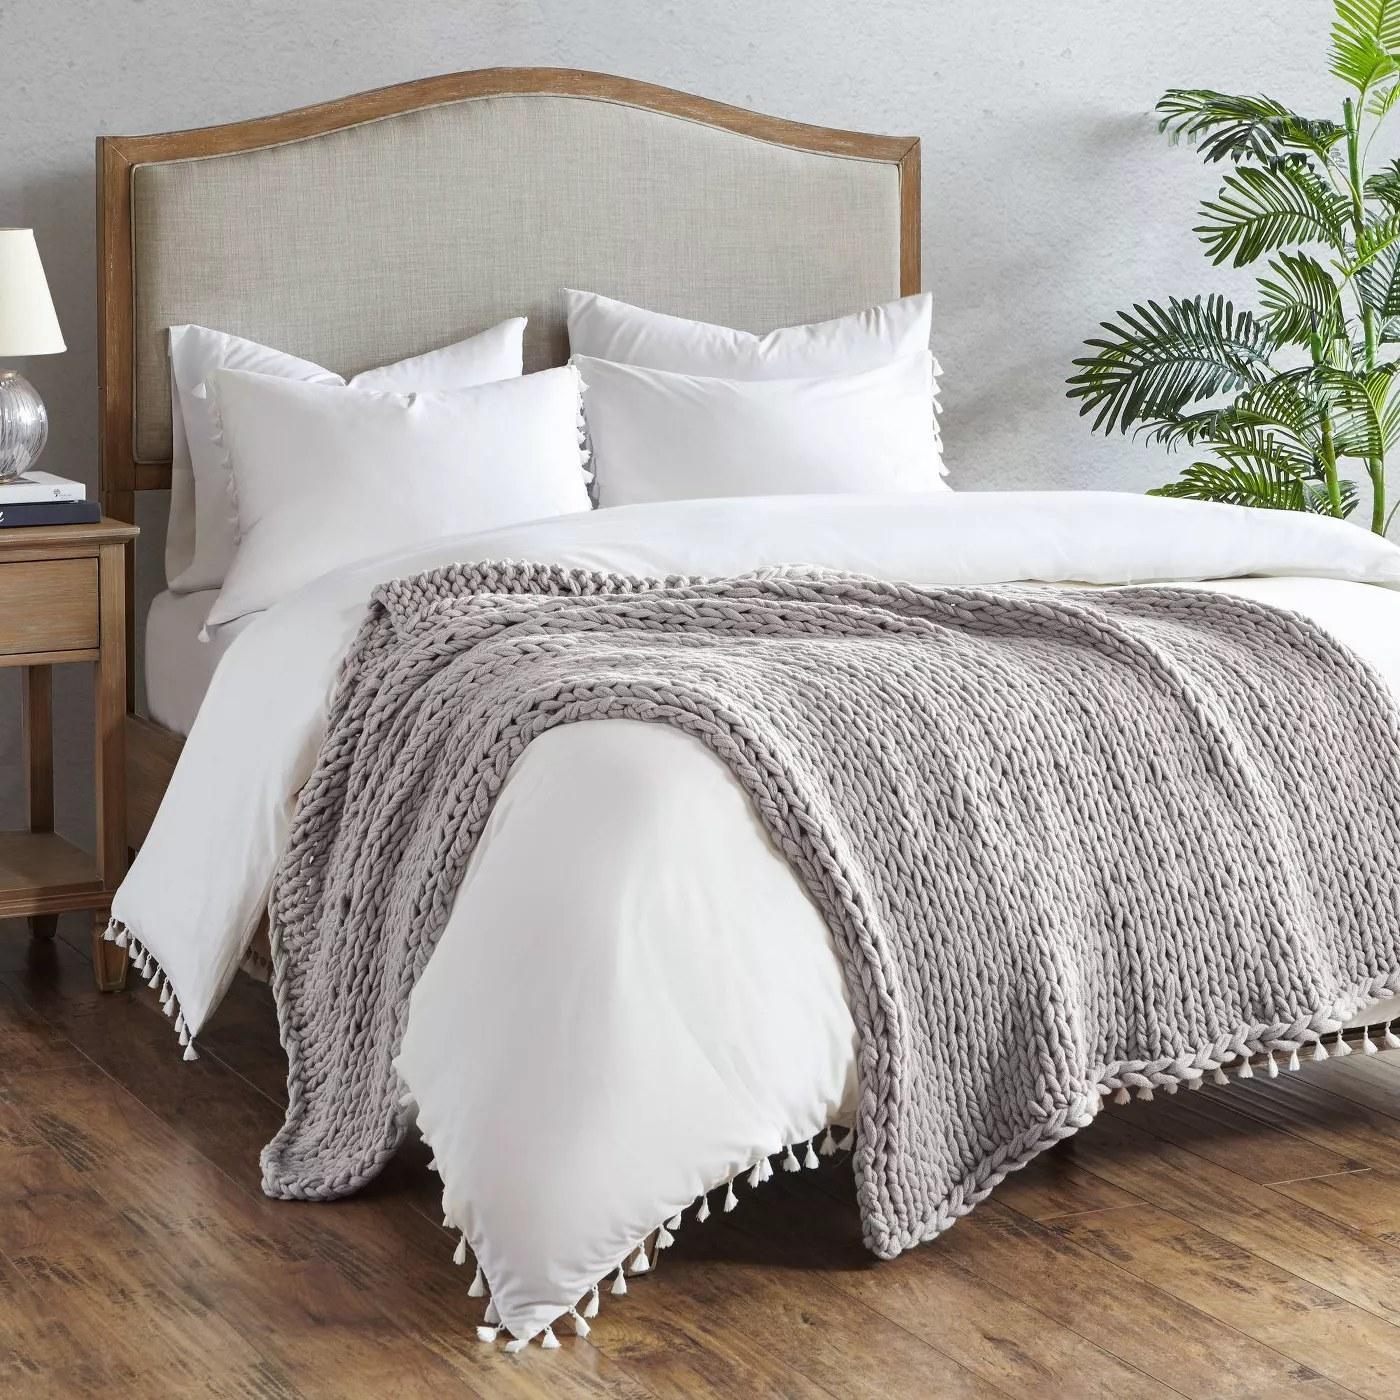 The blanket in gray